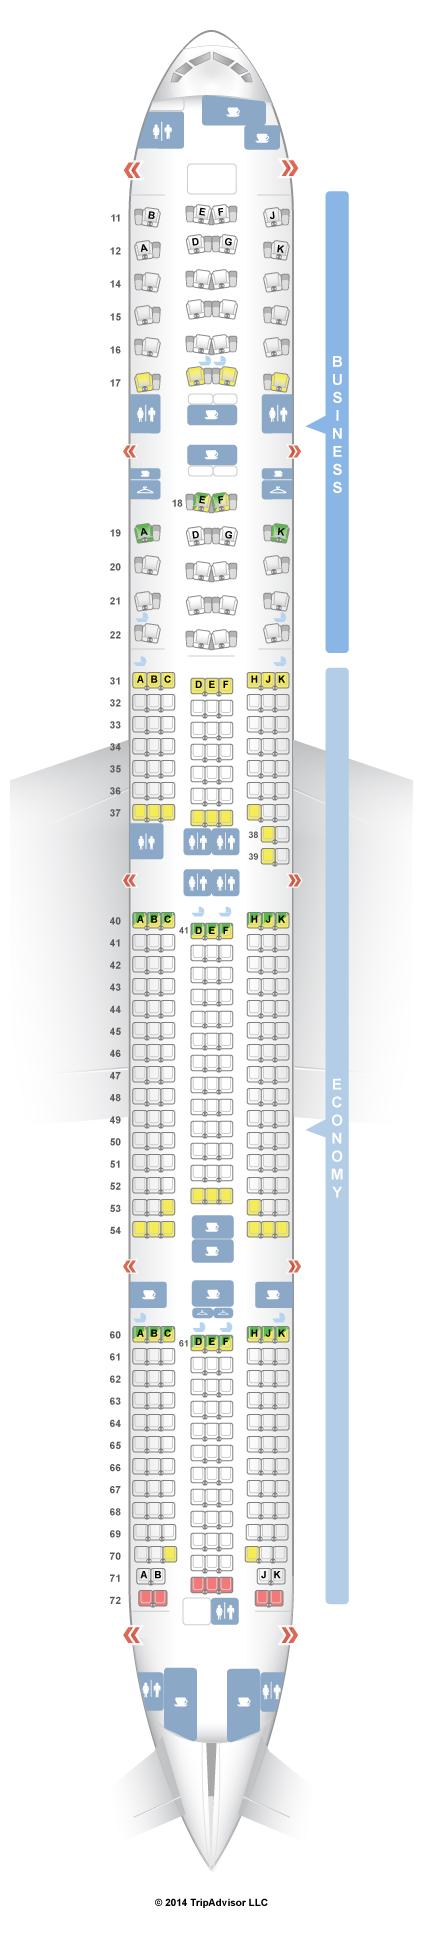 SeatGuru Seat Map Air Transat Airbus A New Business - Us airways seating map